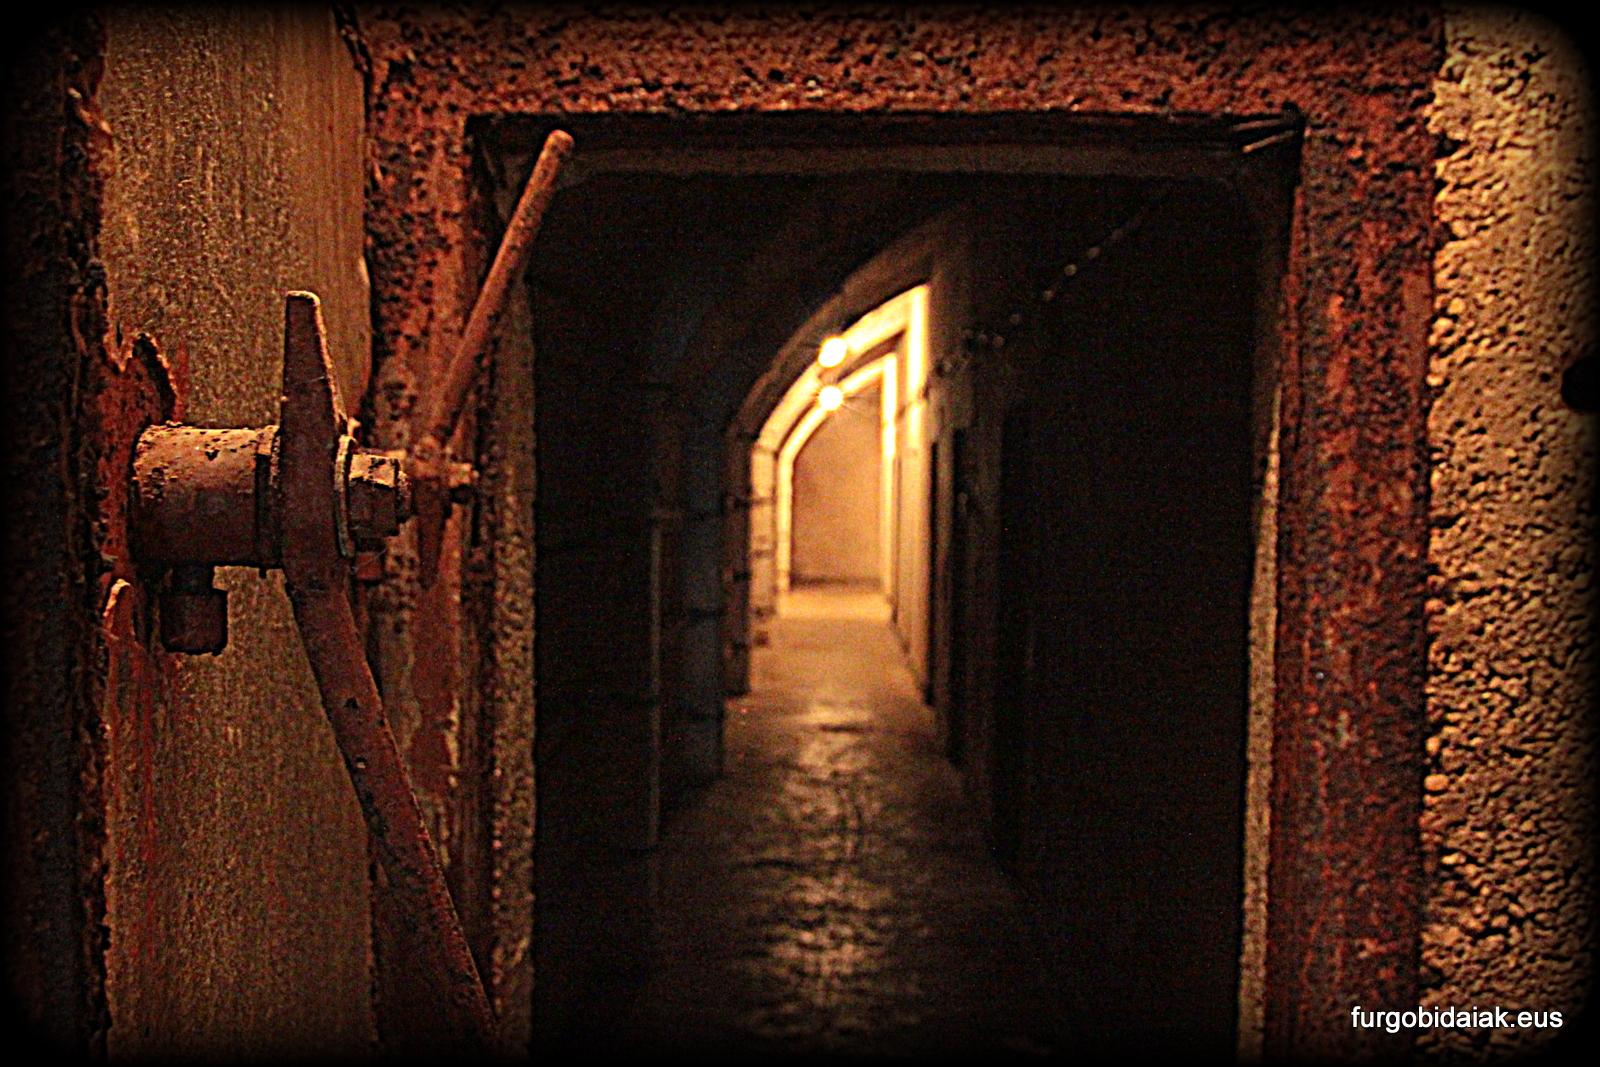 Cold war tunnel, Gjirokaster, Albania